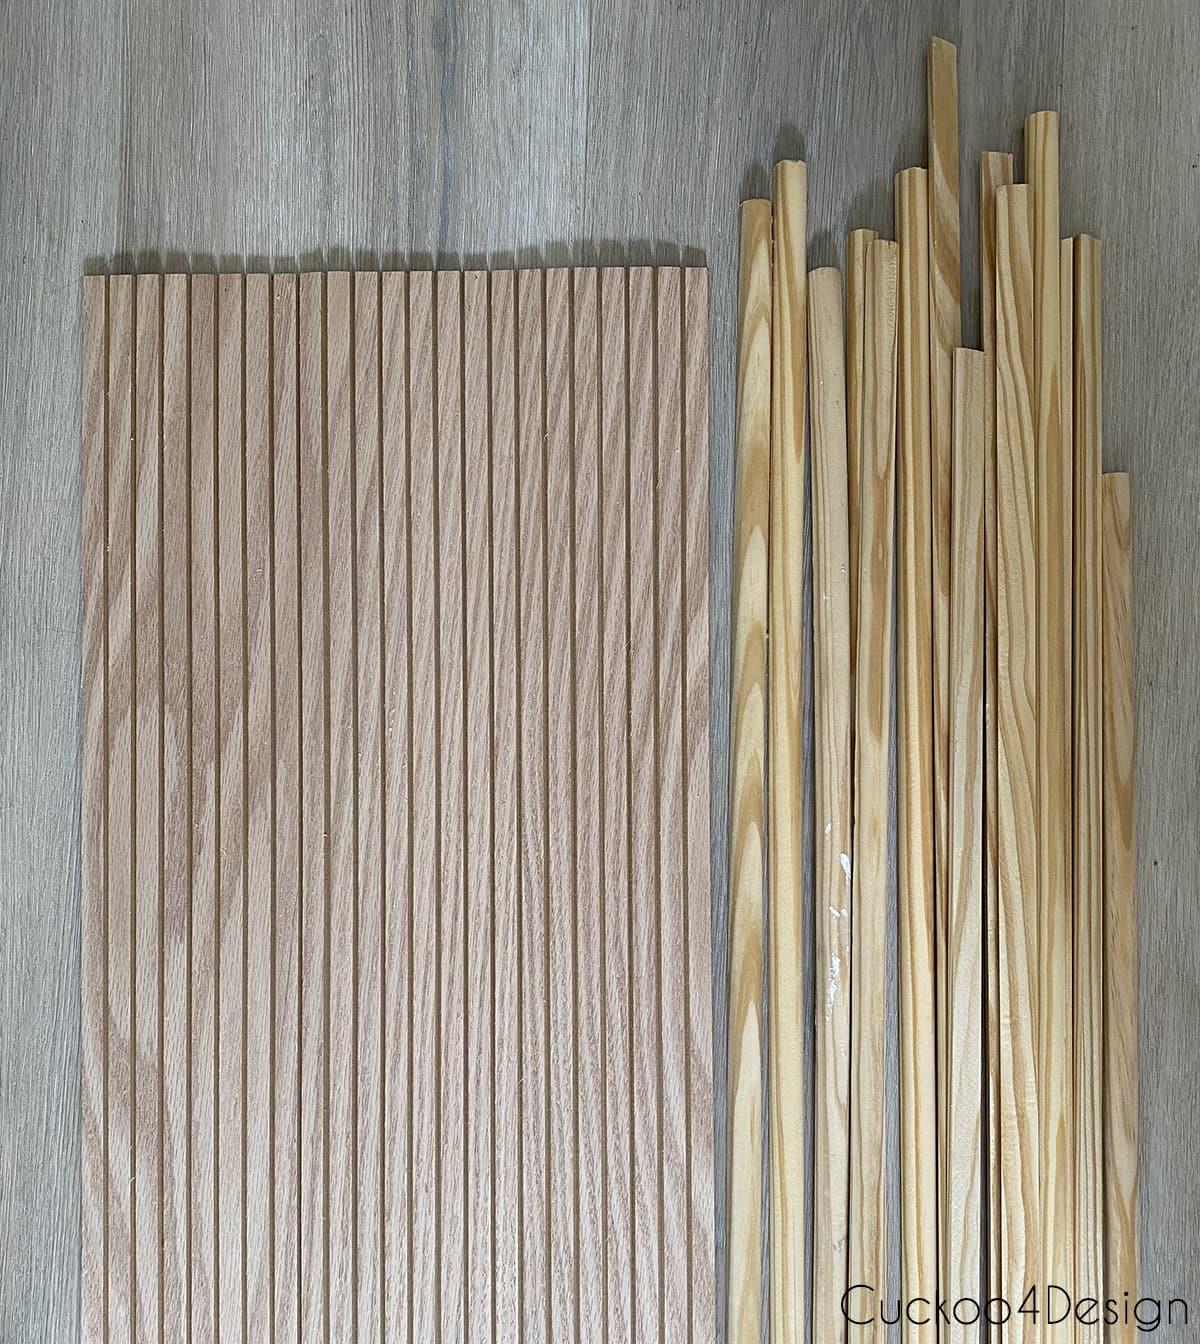 oak pole wrap compared to pine half-round molding